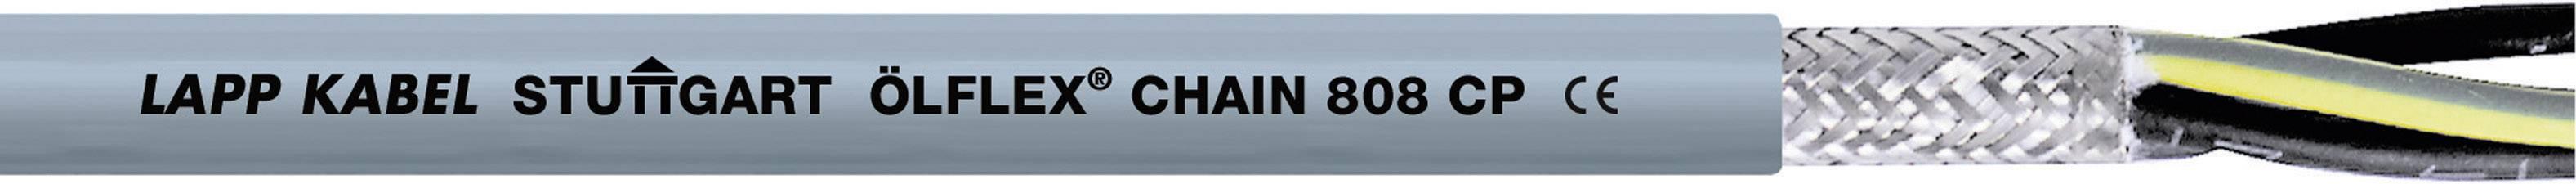 Žíla kabelu LappKabel ÖLFLEX CHAIN 808 CP 5G1,5 (1027778), 5x 1,5 mm², polyurethan, Ø 9,1 mm, stíněný, 50 m, š